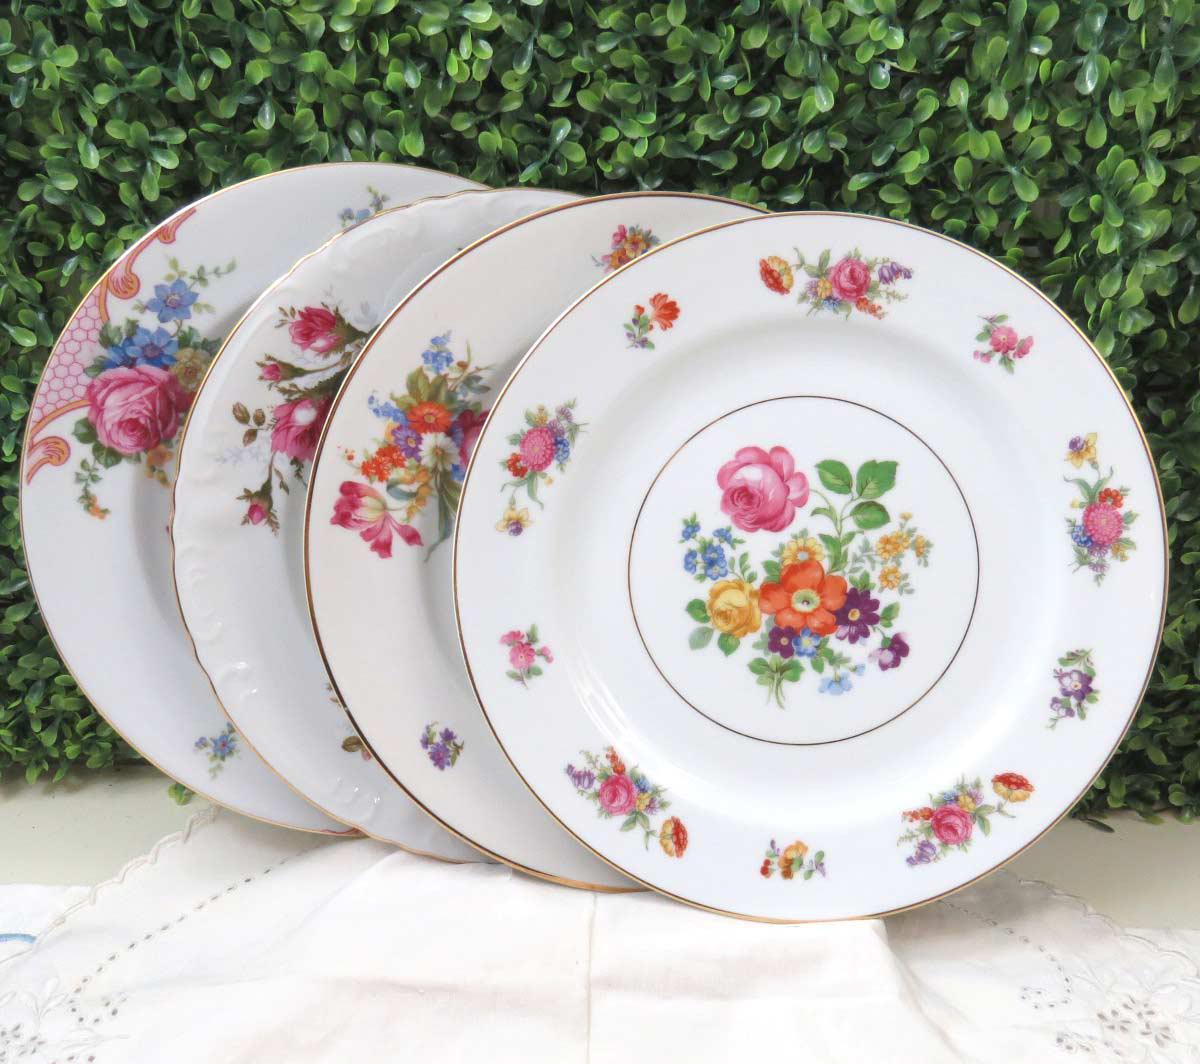 Vintage Mismatched Fine China Dinner Plates - Set of 4 - Image 7 of 8 & Vintage Mismatched Fine China Dinner Plates - Set of 4 | Chairish